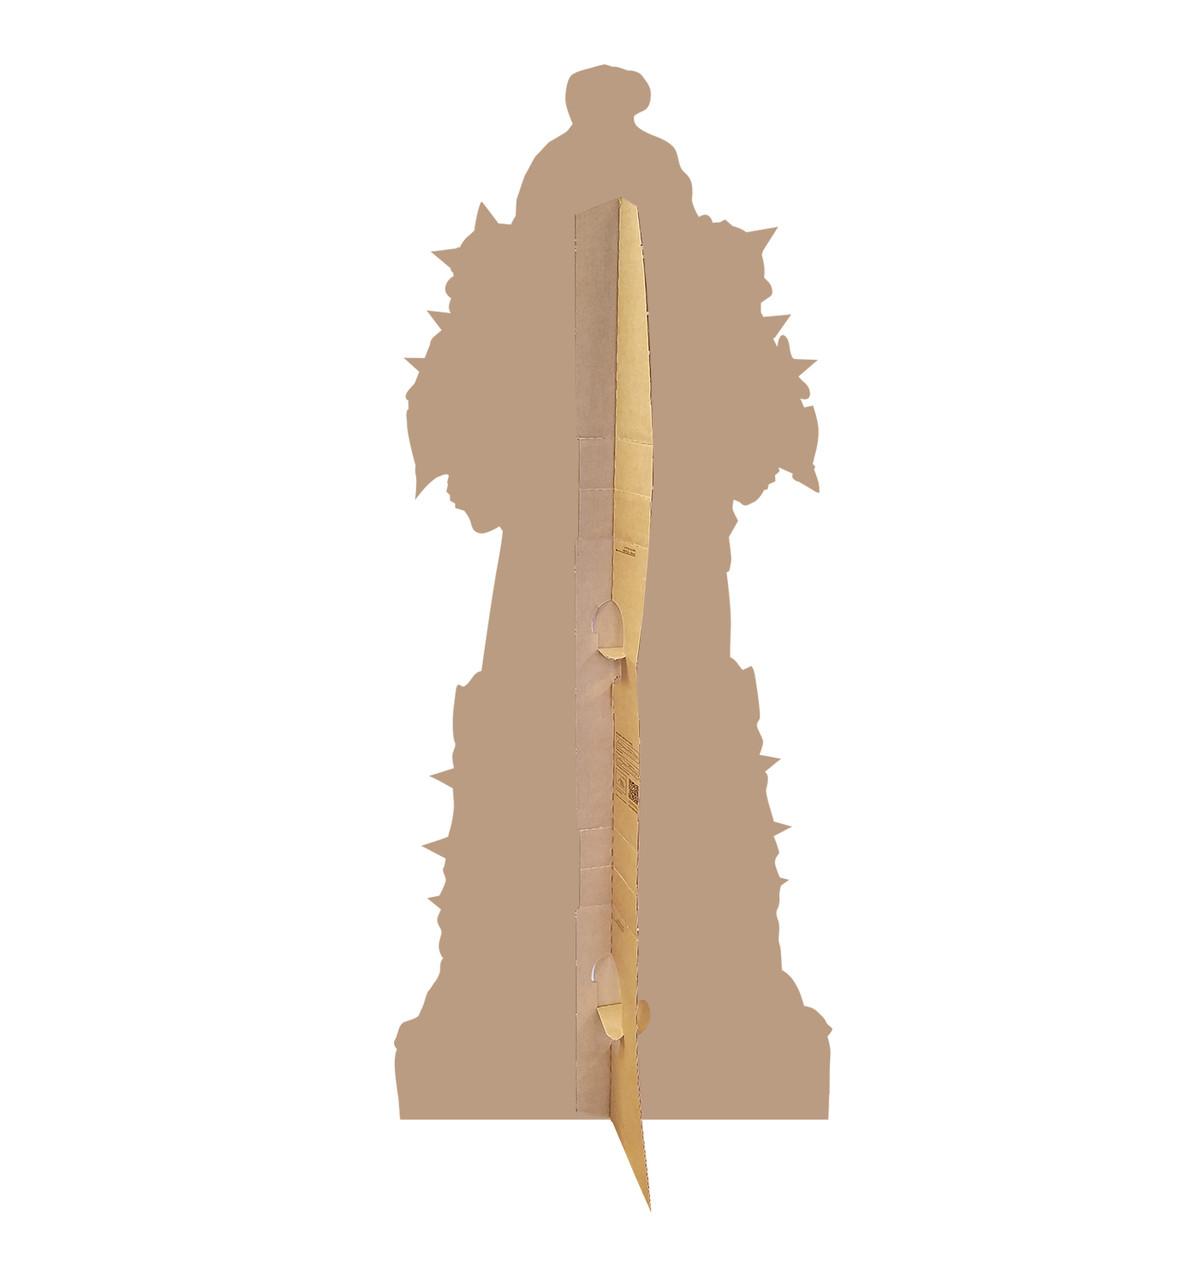 Life-size The Starchild (KISS) Cardboard Standup |Cardboard Cutout